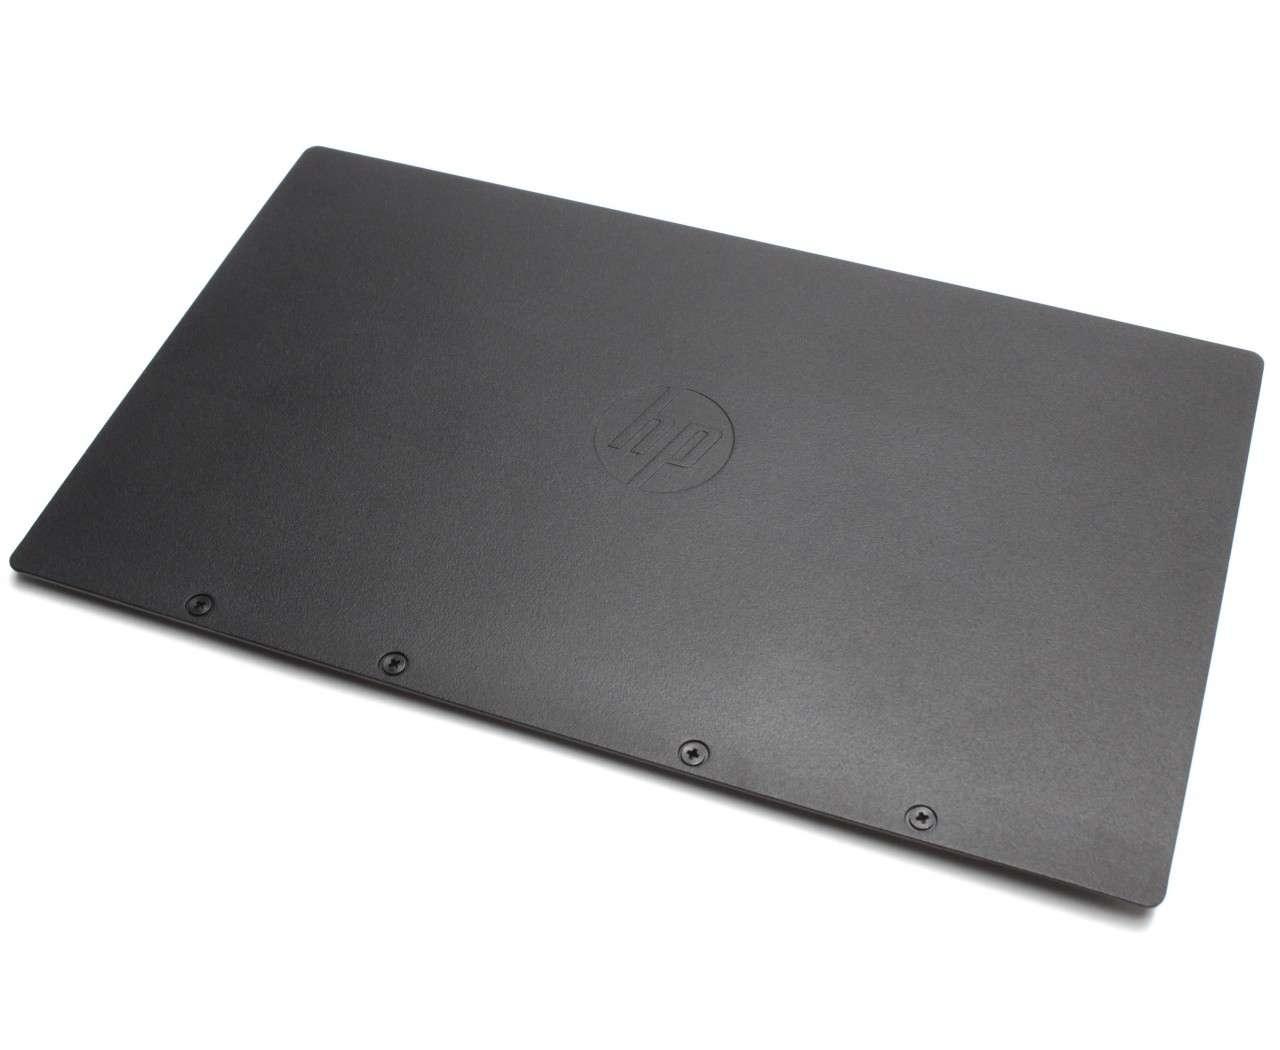 Baterie HP 687946-001 Originala 21Wh imagine powerlaptop.ro 2021